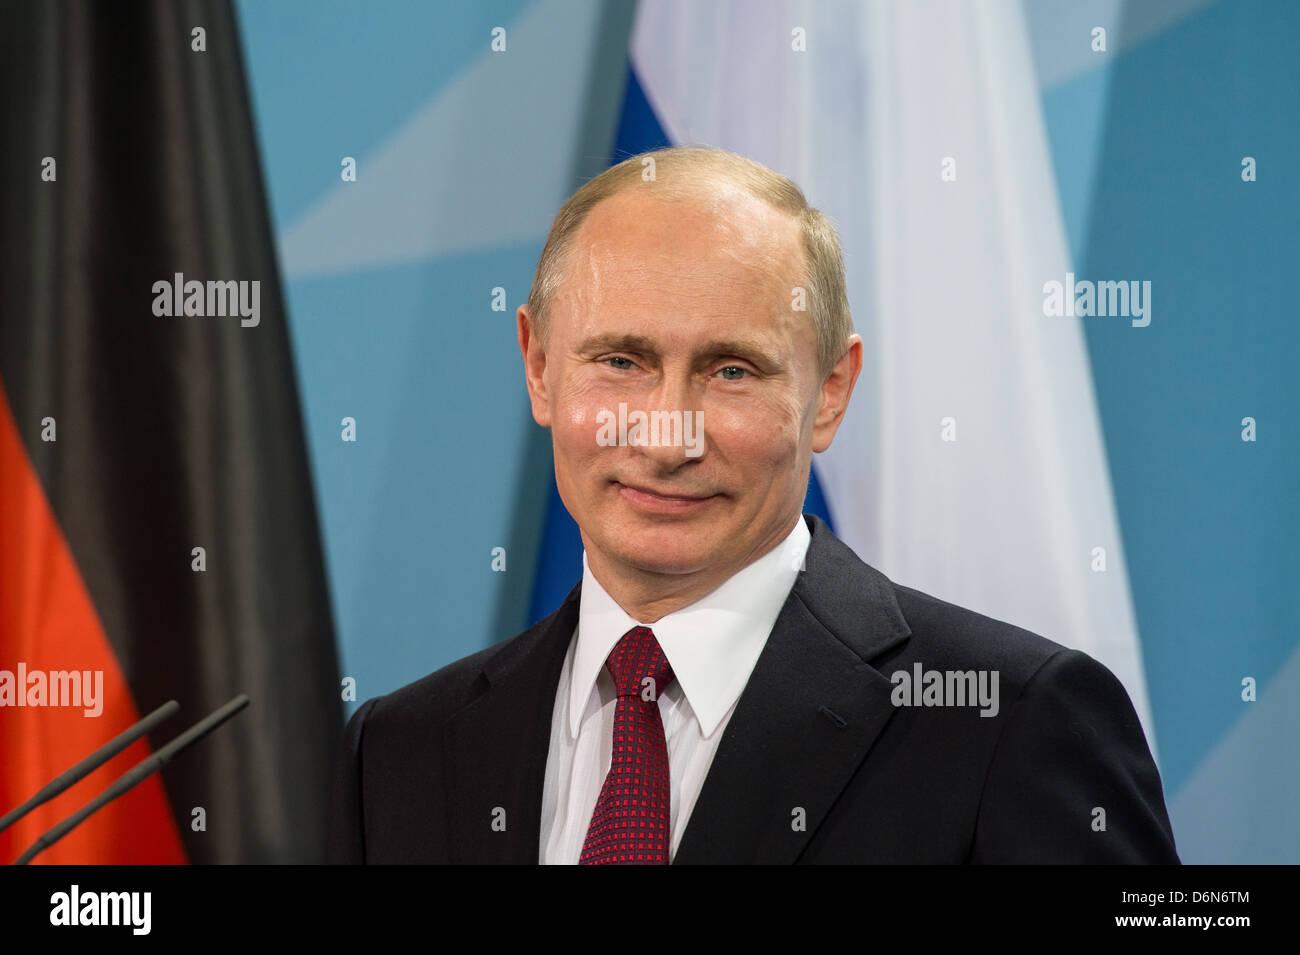 Berlin, Germany, Vladimir Vladimirovich Putin, President of the Russian Federation, the Federal Chancellery - Stock Image